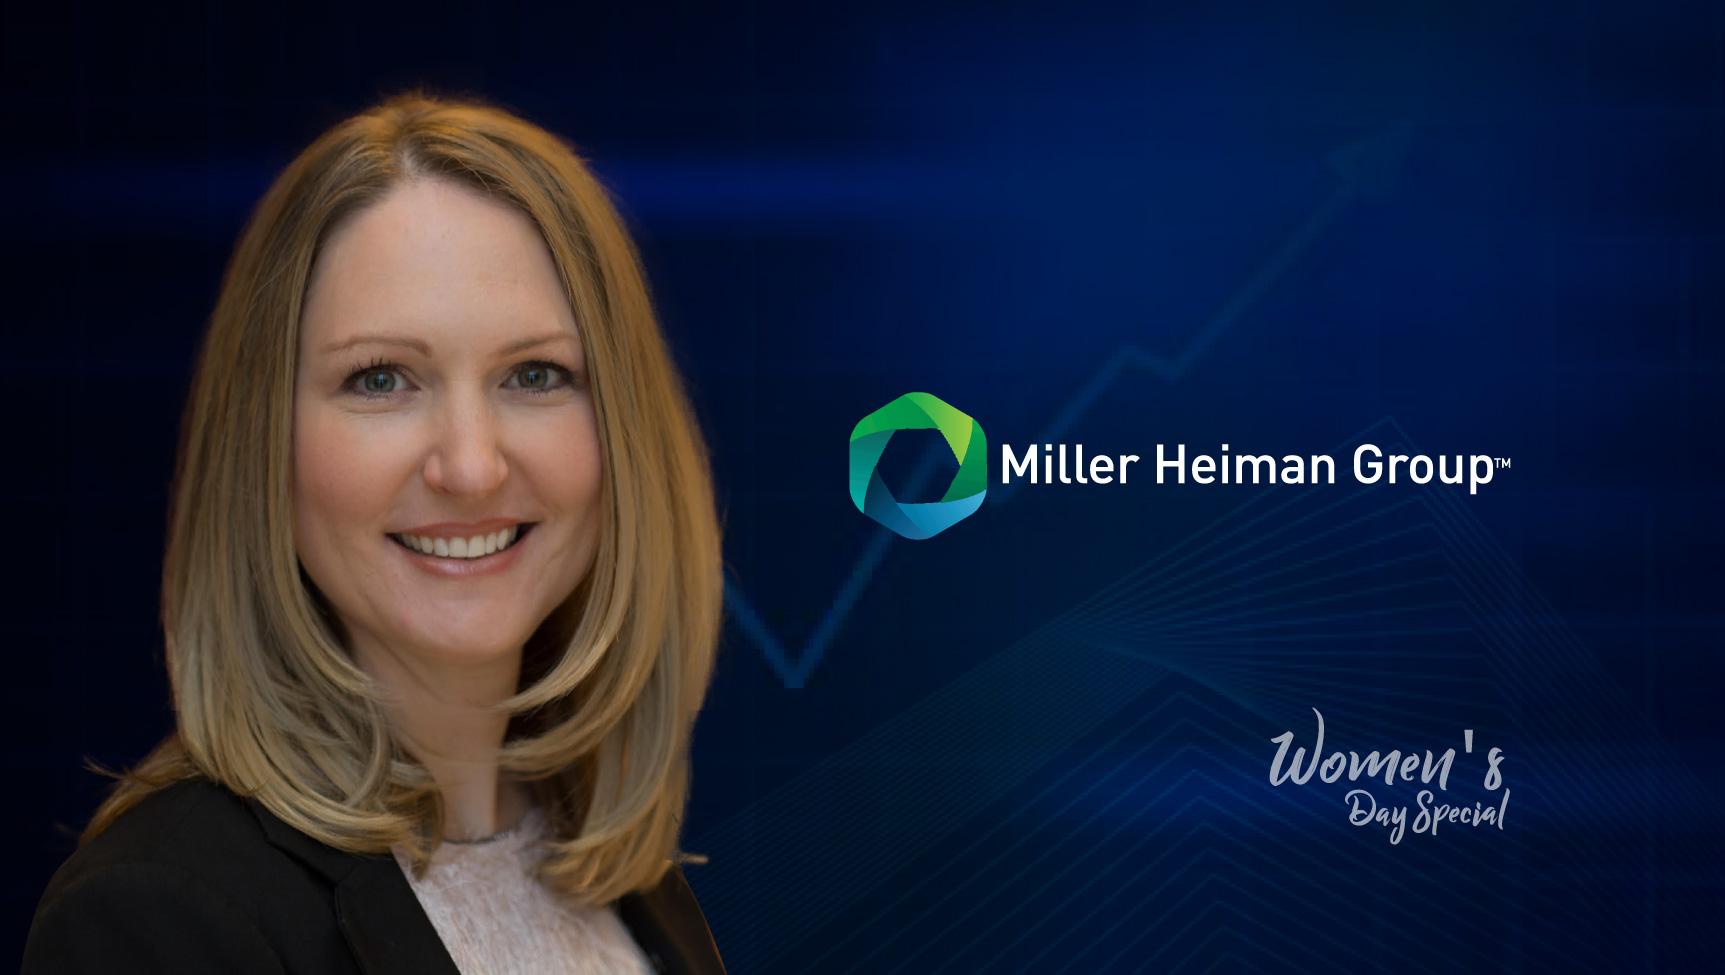 SalesTech Interview with Dana Hamerschlag, Chief Product Officer at Miller Heiman Group